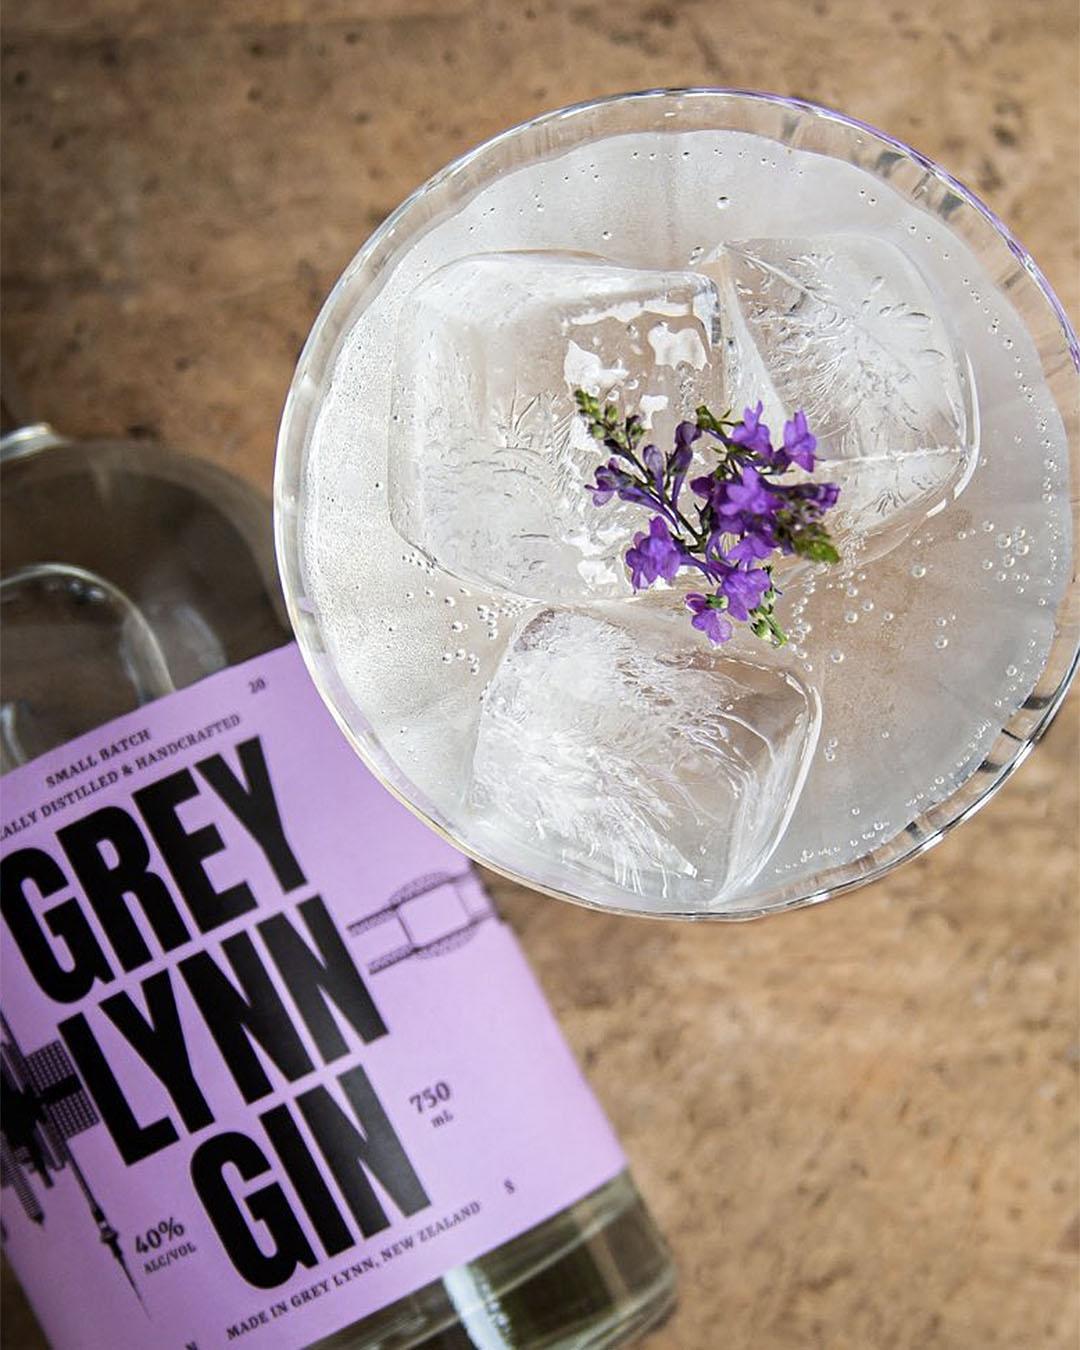 Grey Lynn Gin from Cove 27